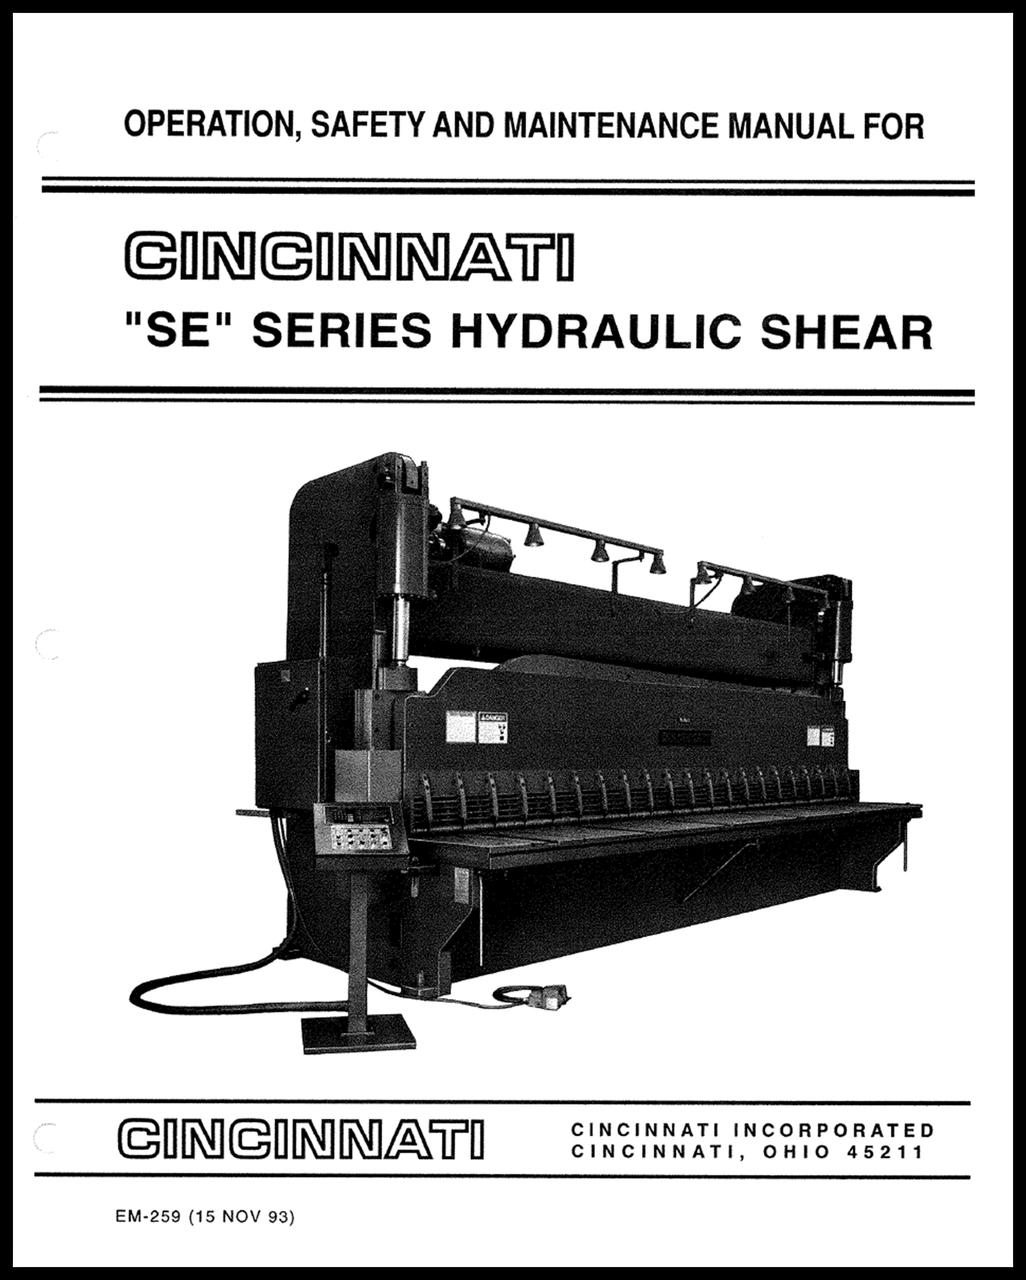 EM-259 SE Series Hydraulic Shear Operation, Safety, and Maintenance Manual